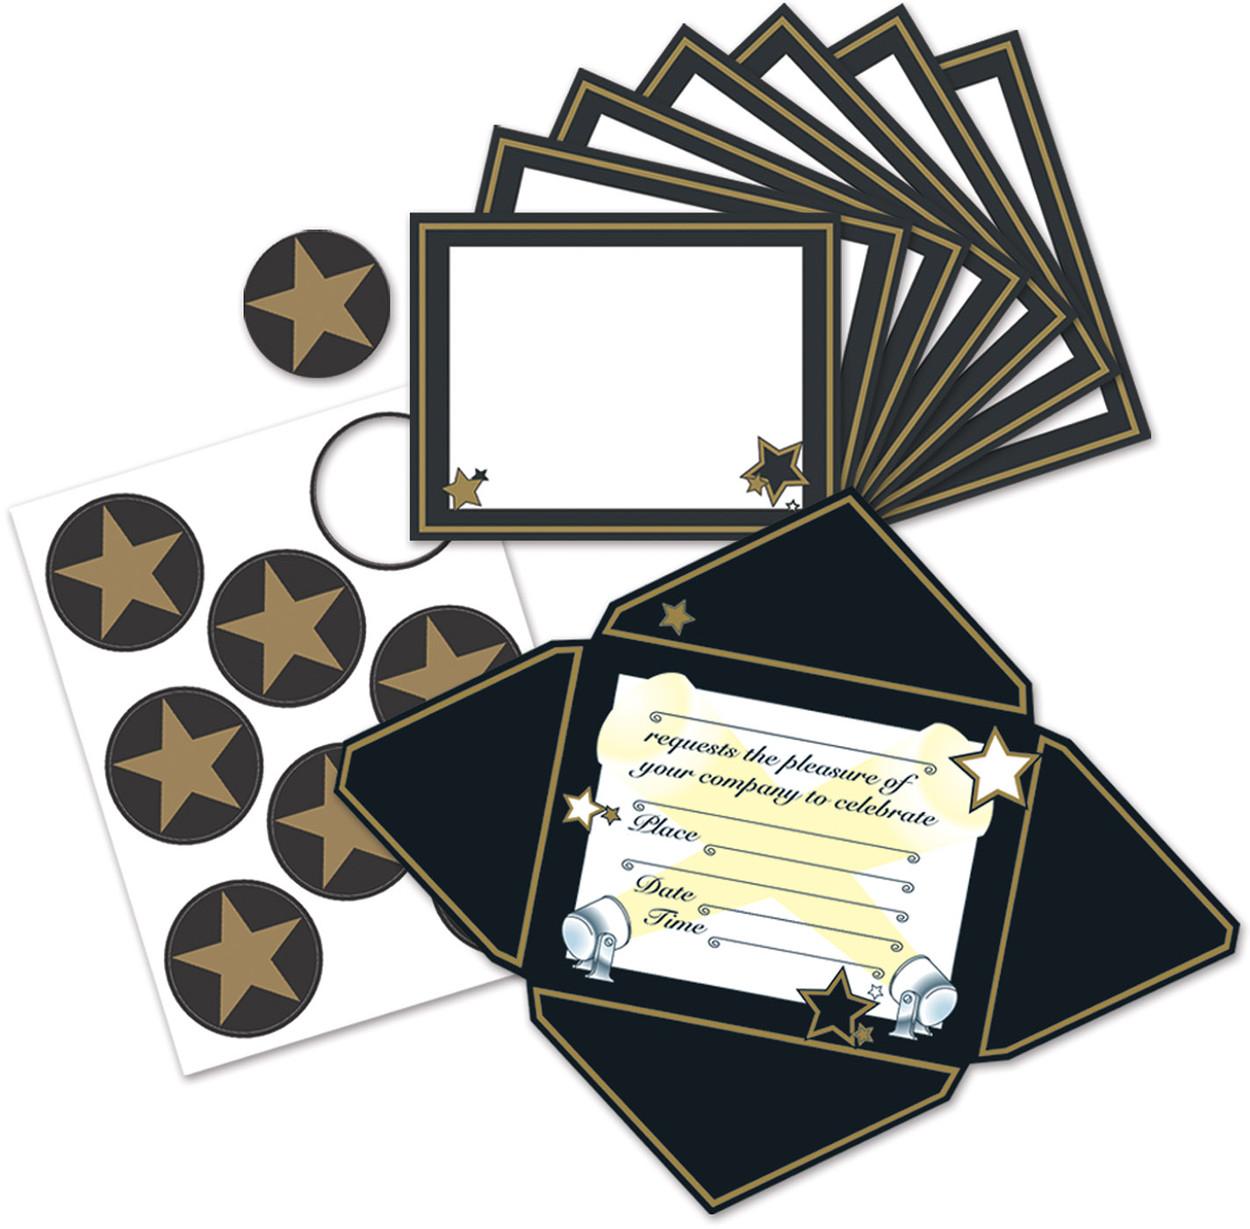 Awards Night Party Celebration Invitation Cards And Stickers Set Decoration